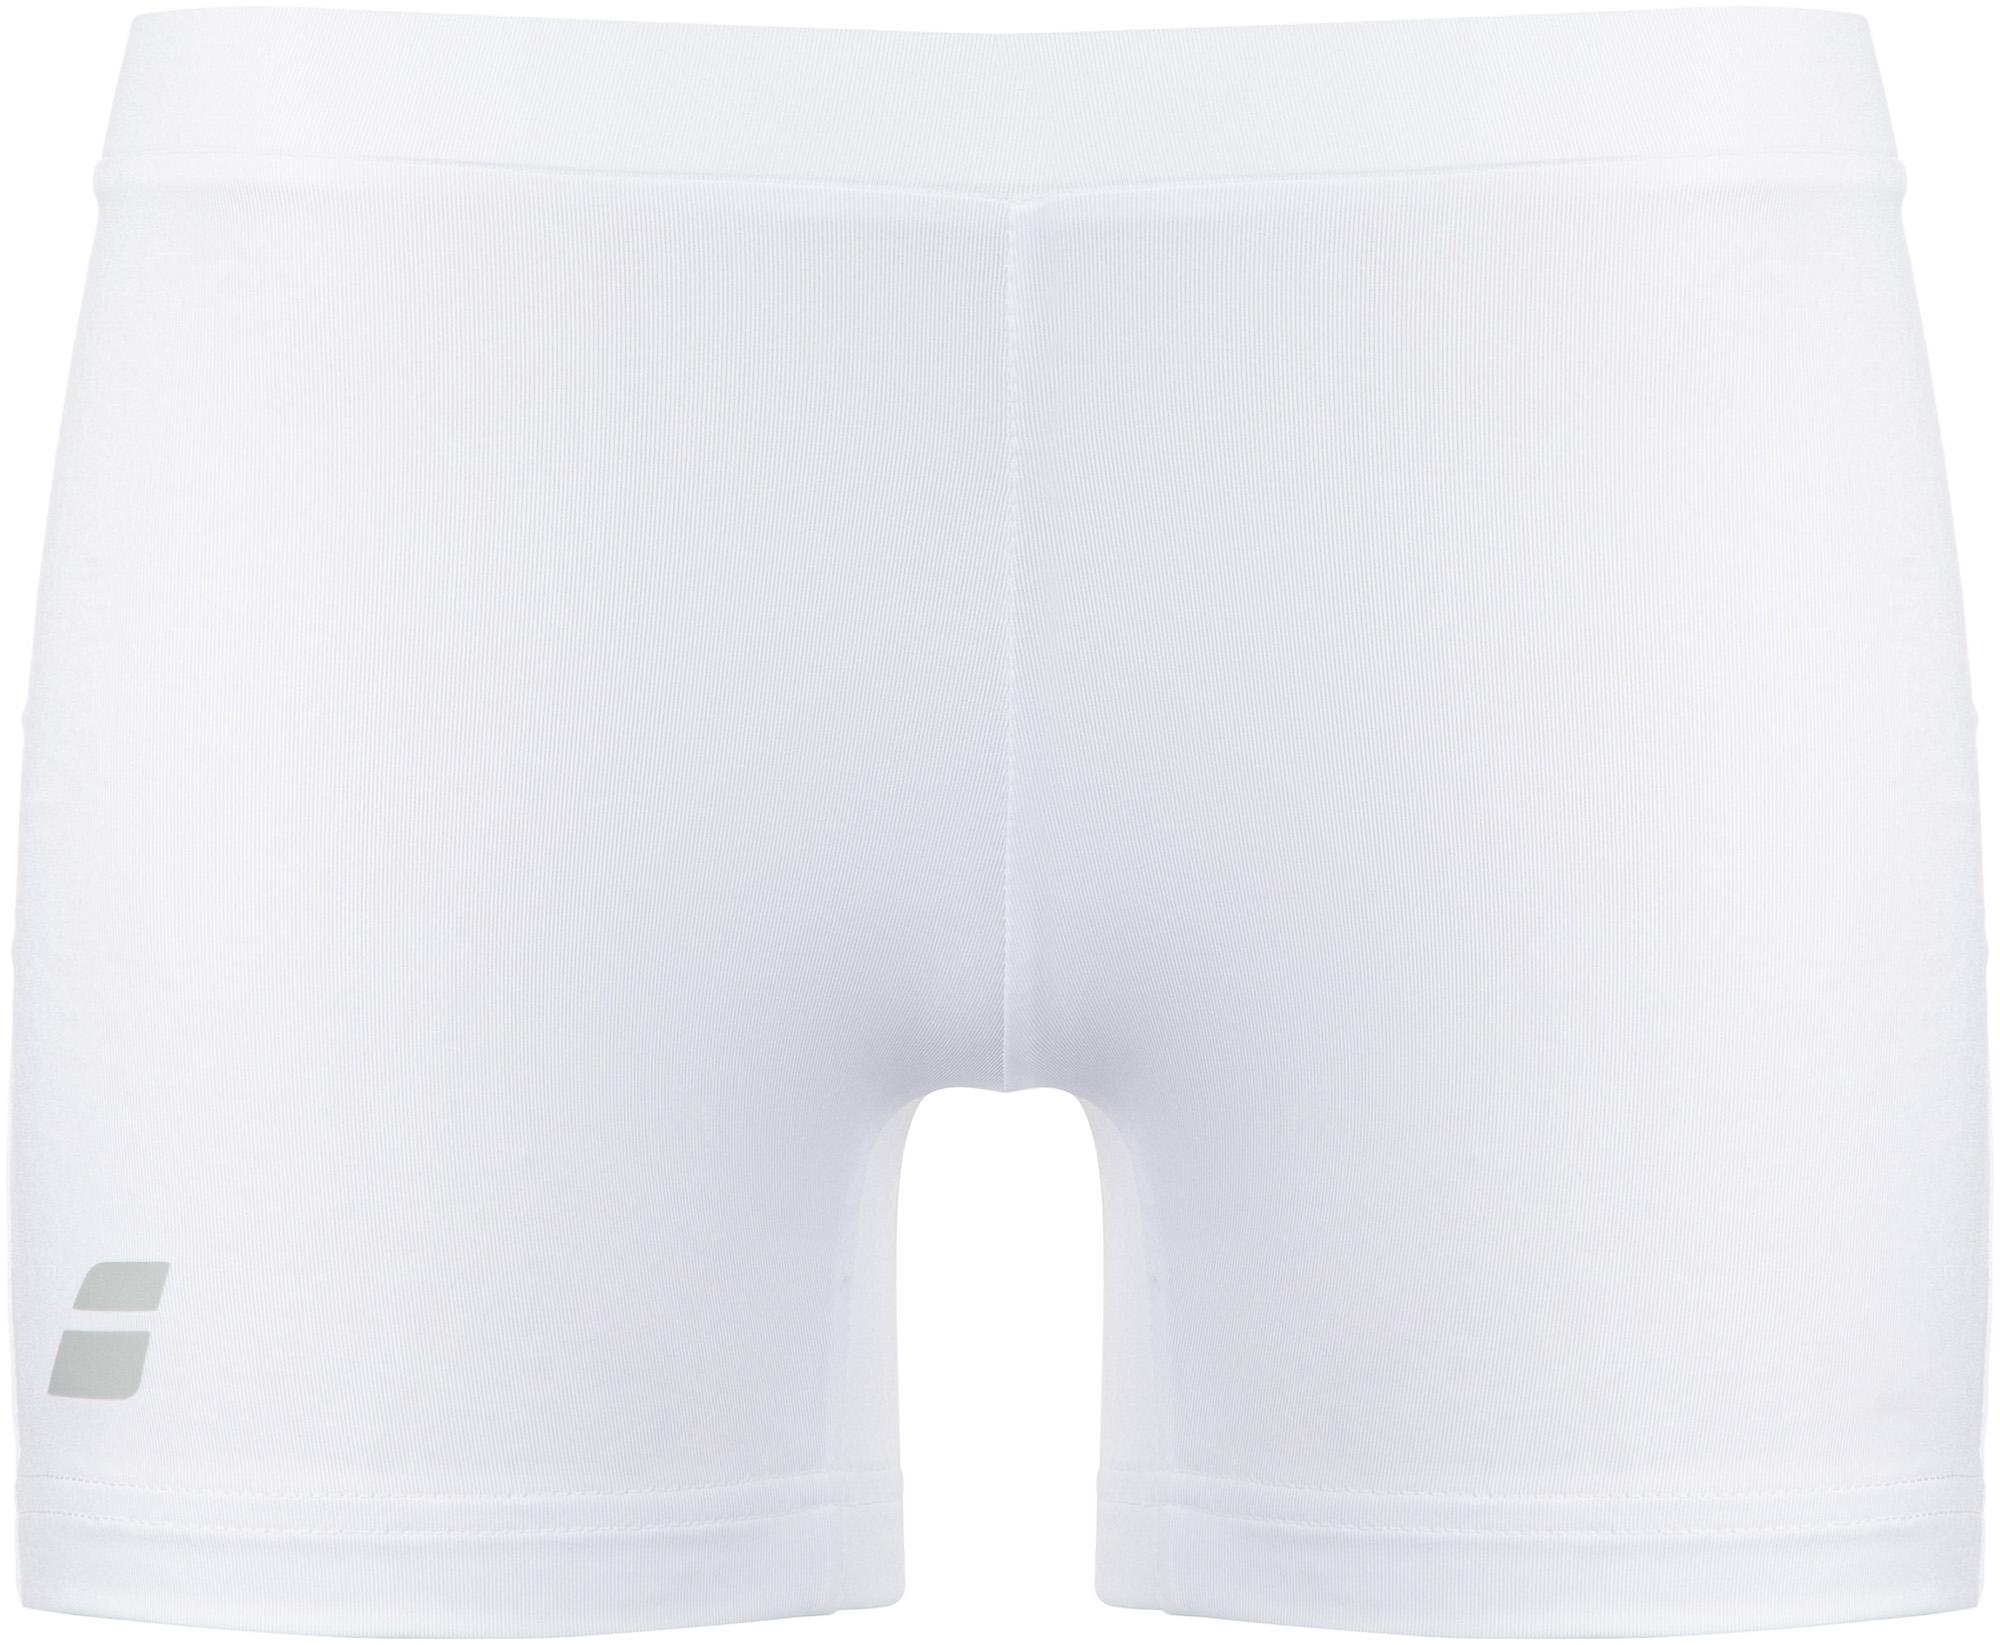 Babolat Шорты женские Babolat Complete, размер 44-46 babolat бейсболка babolat basic logo